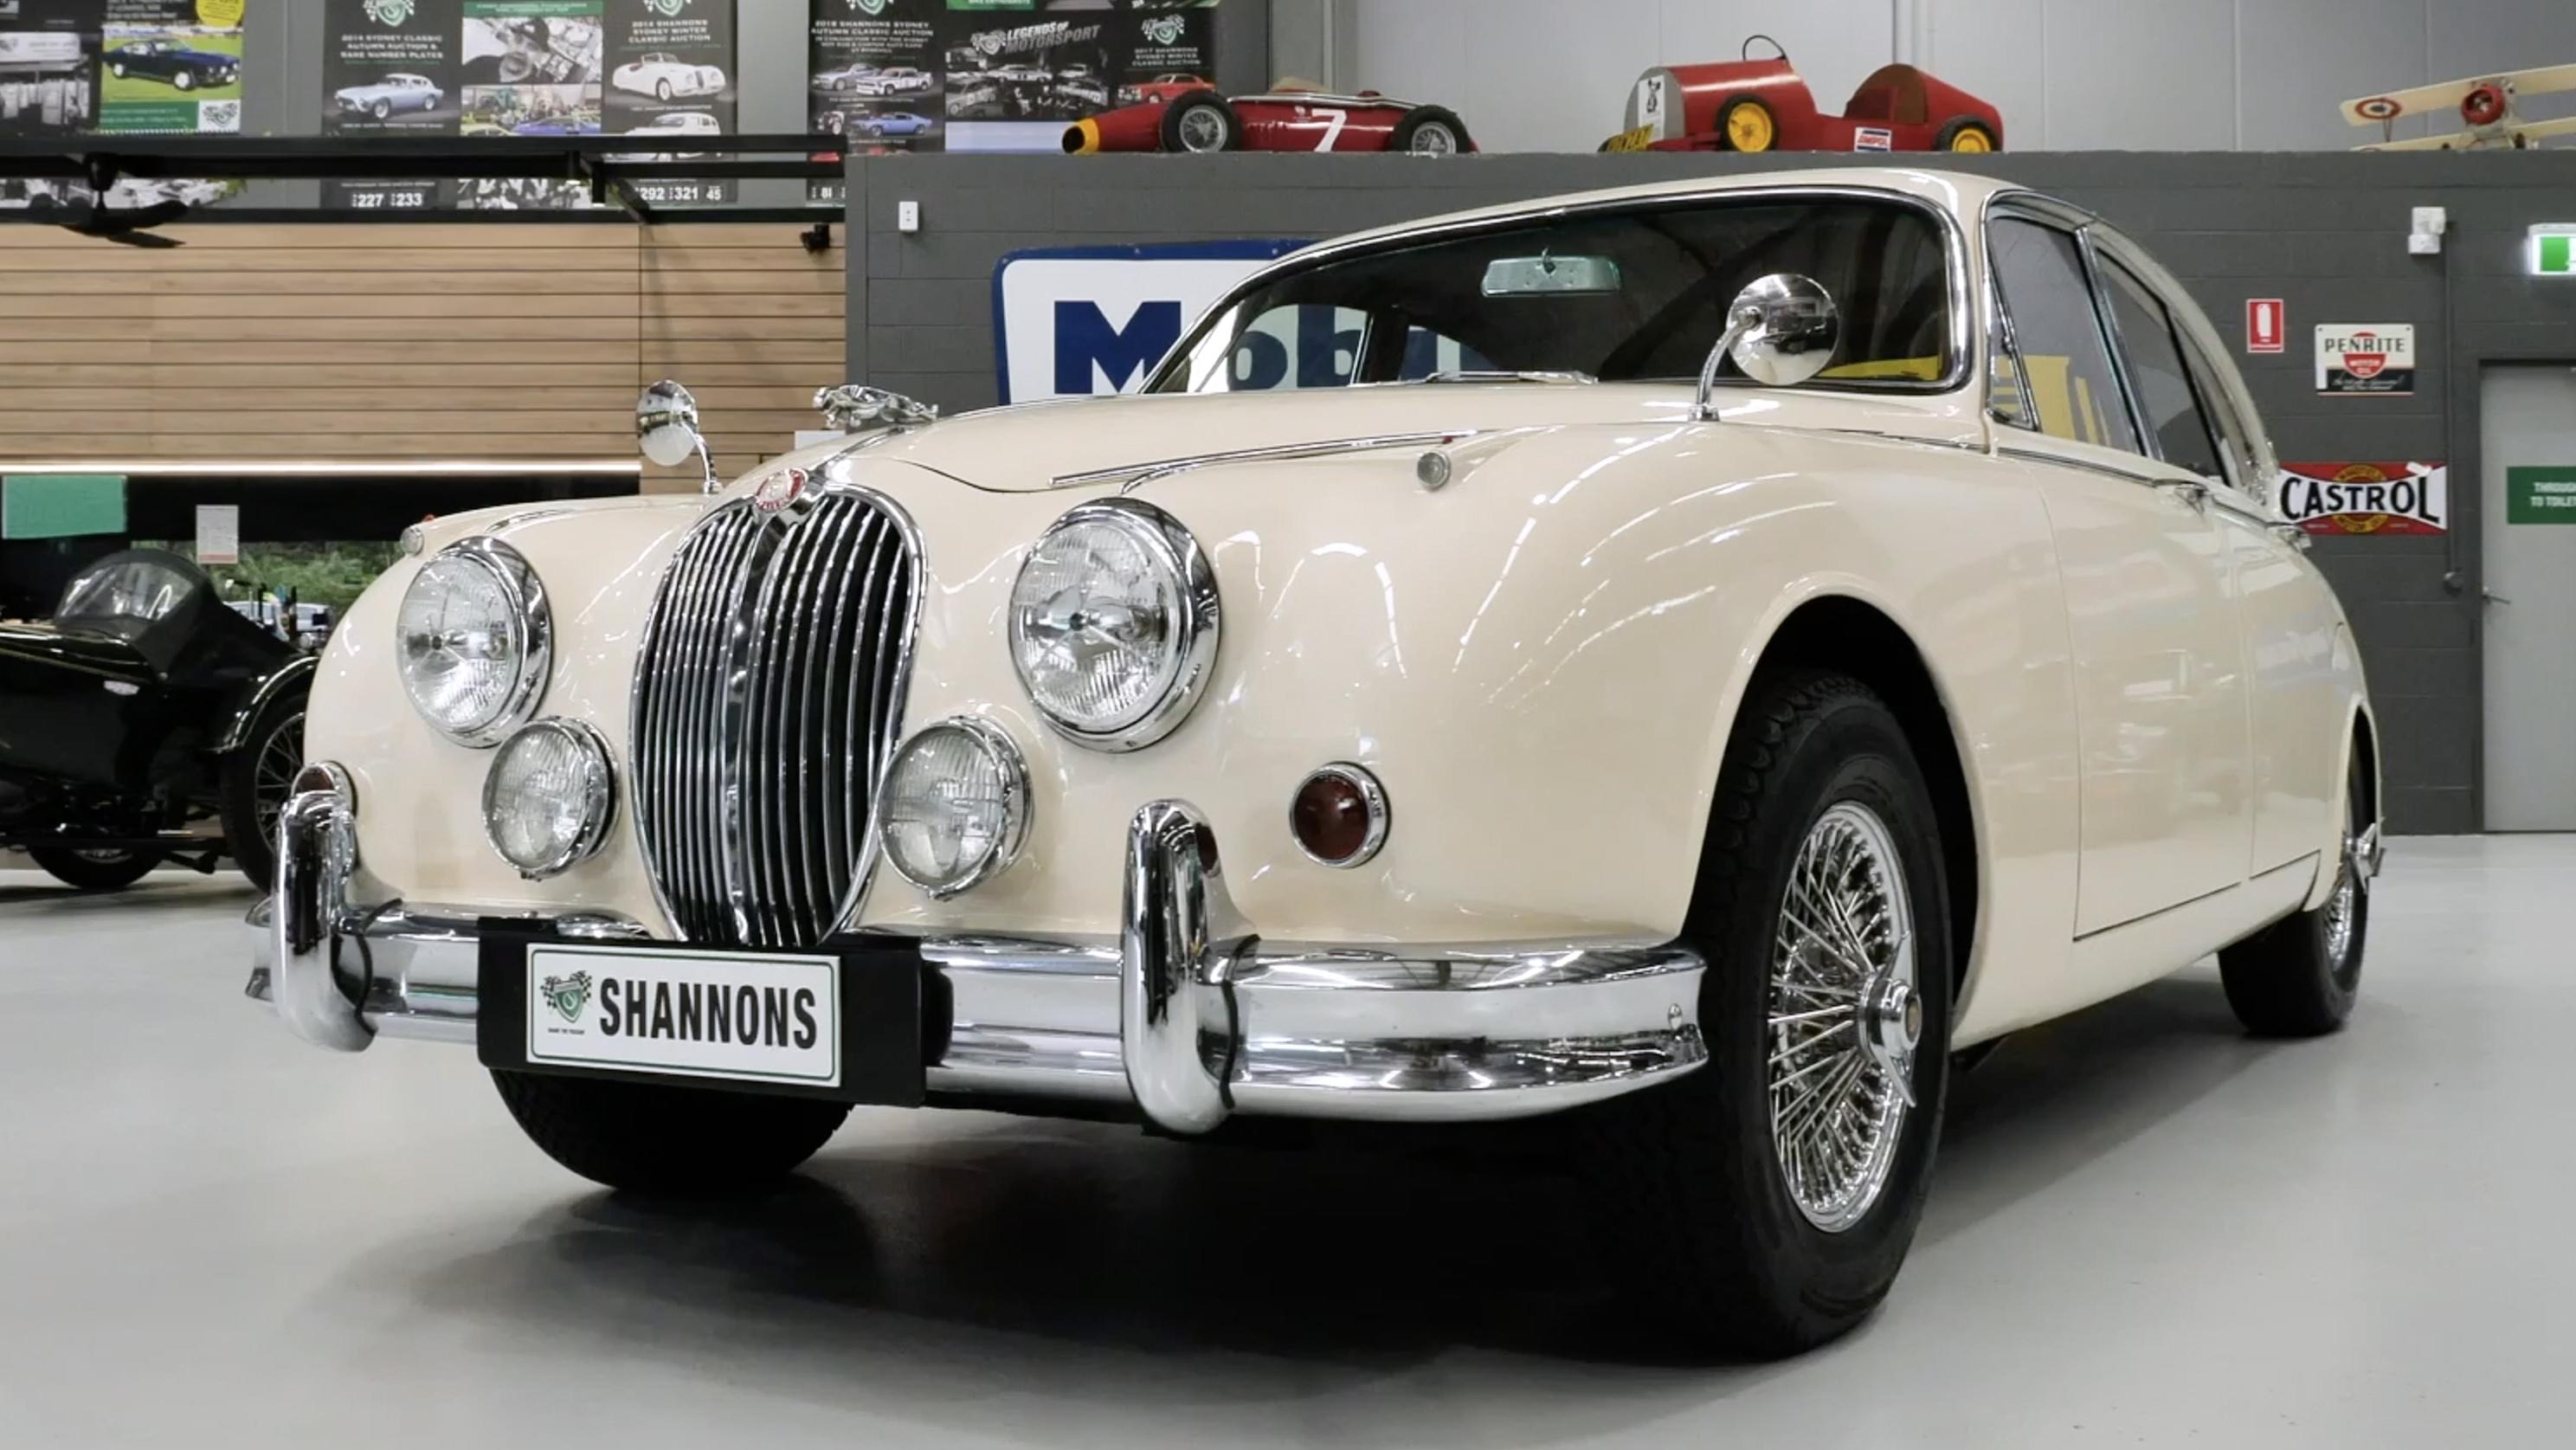 1966 Jaguar Mark 2 3.8 'Manual Overdrive' Saloon - 2021 Shannons Summer Timed Online Auction